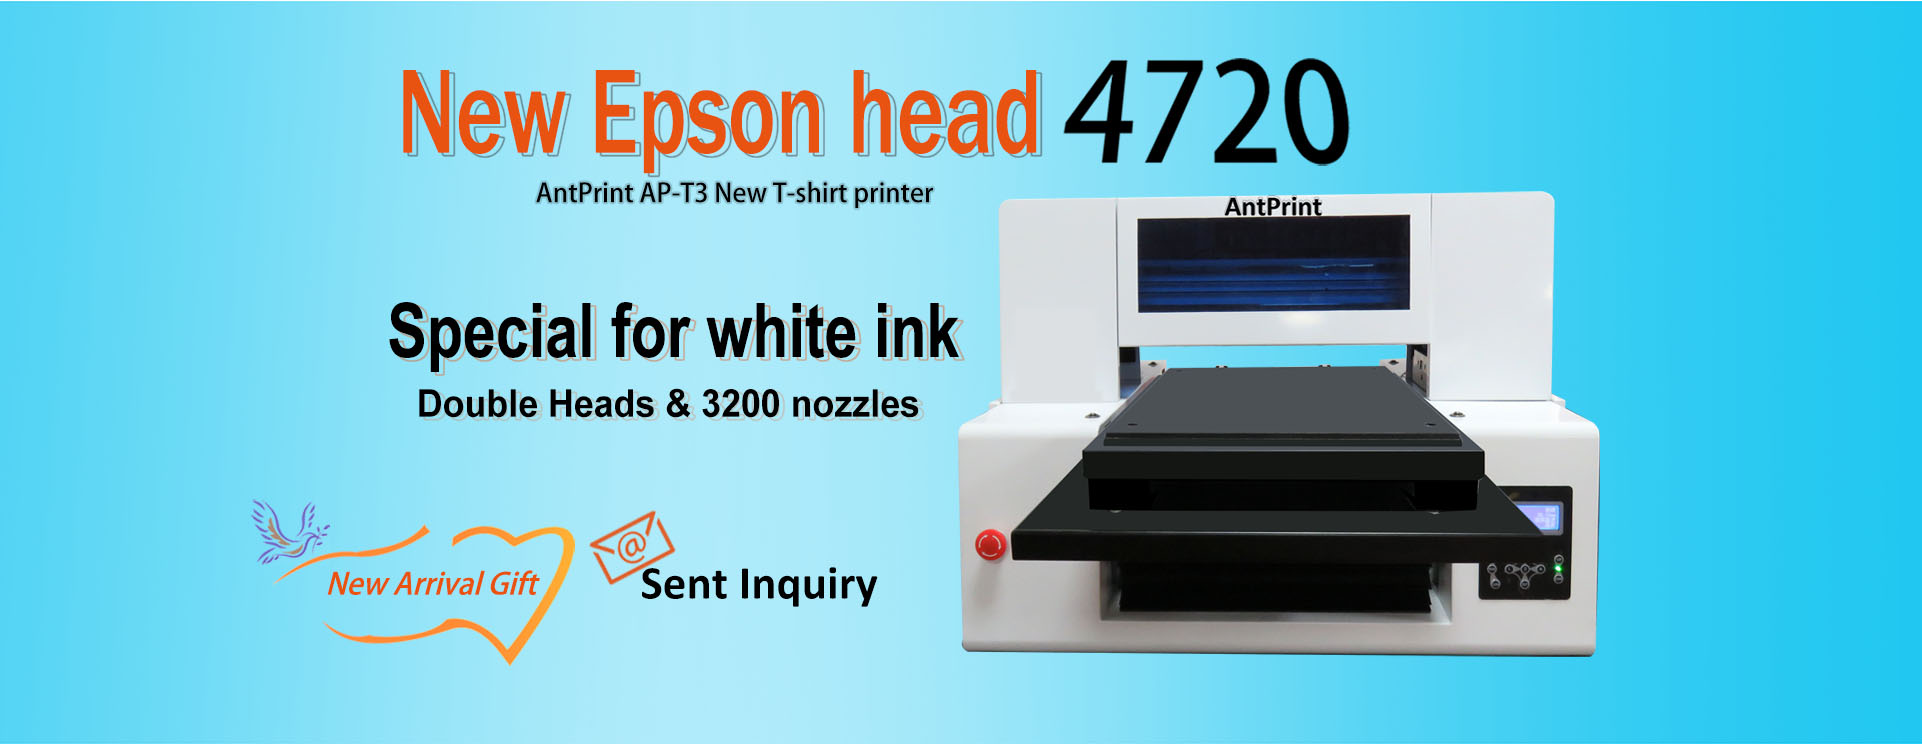 antprint new double head 4720 dtg printer